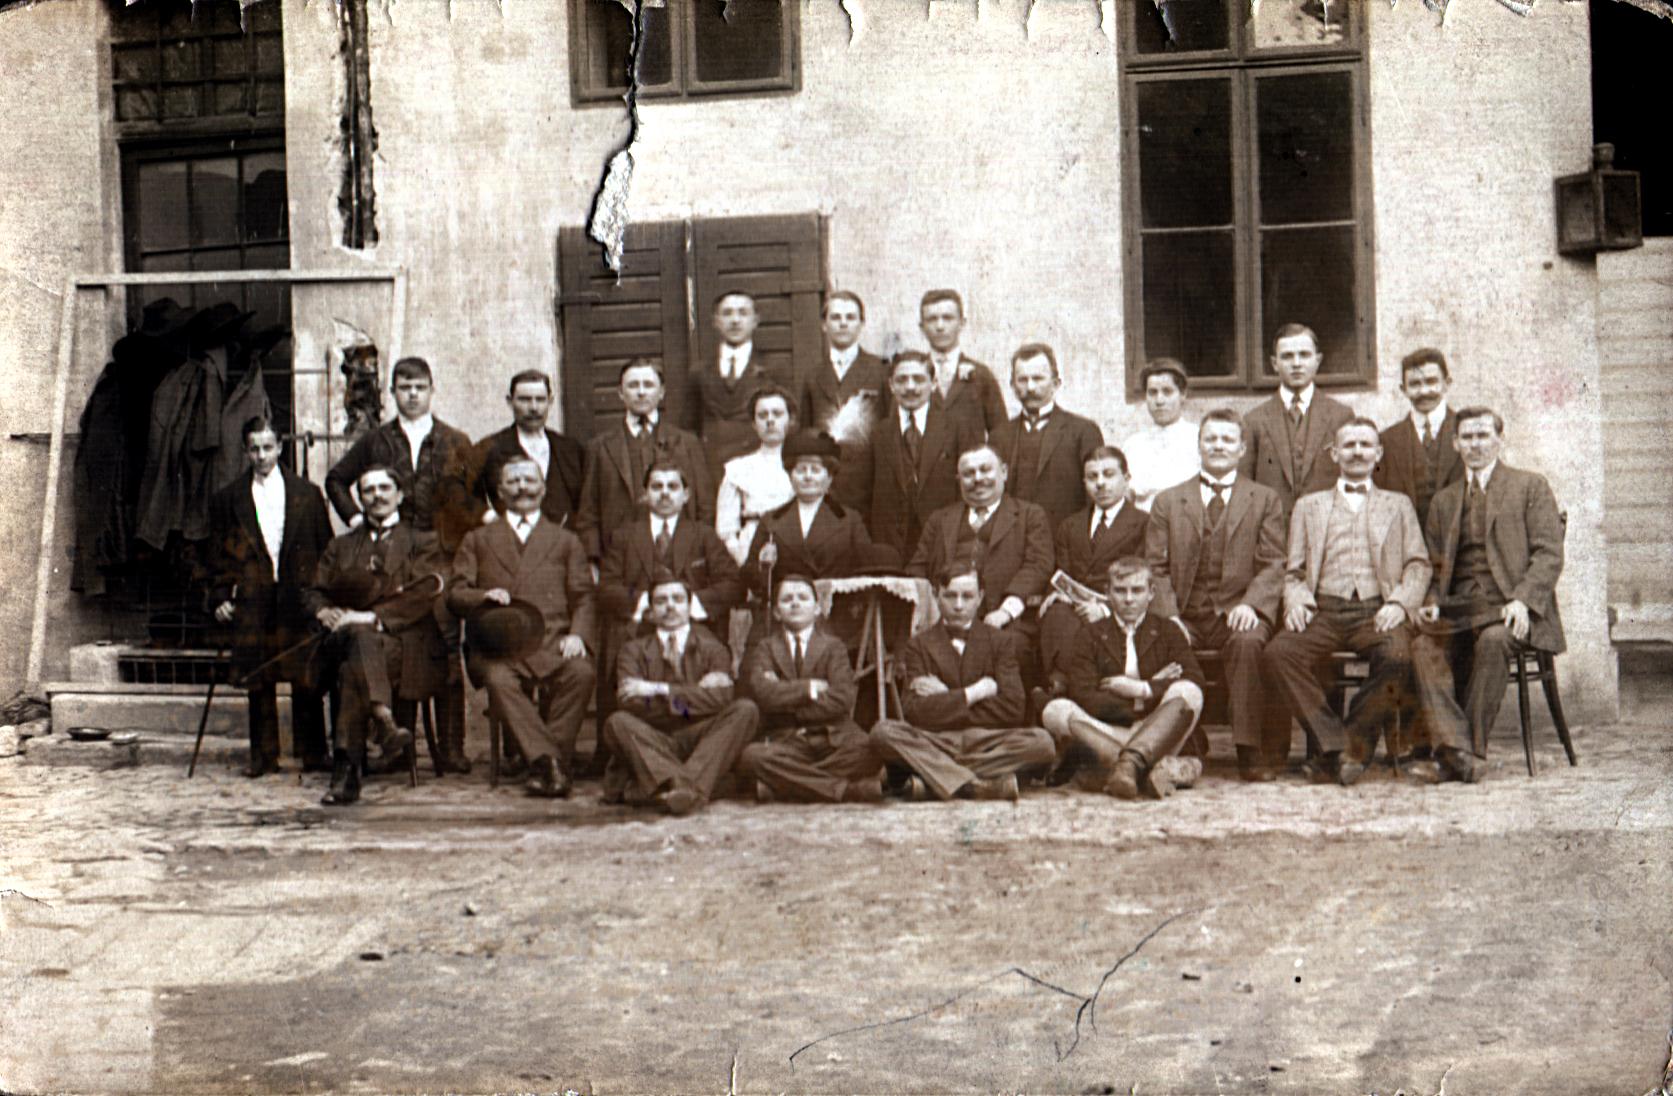 The staff of Ilona Seifert's paternal grandfather Bernat Riemer's bakery